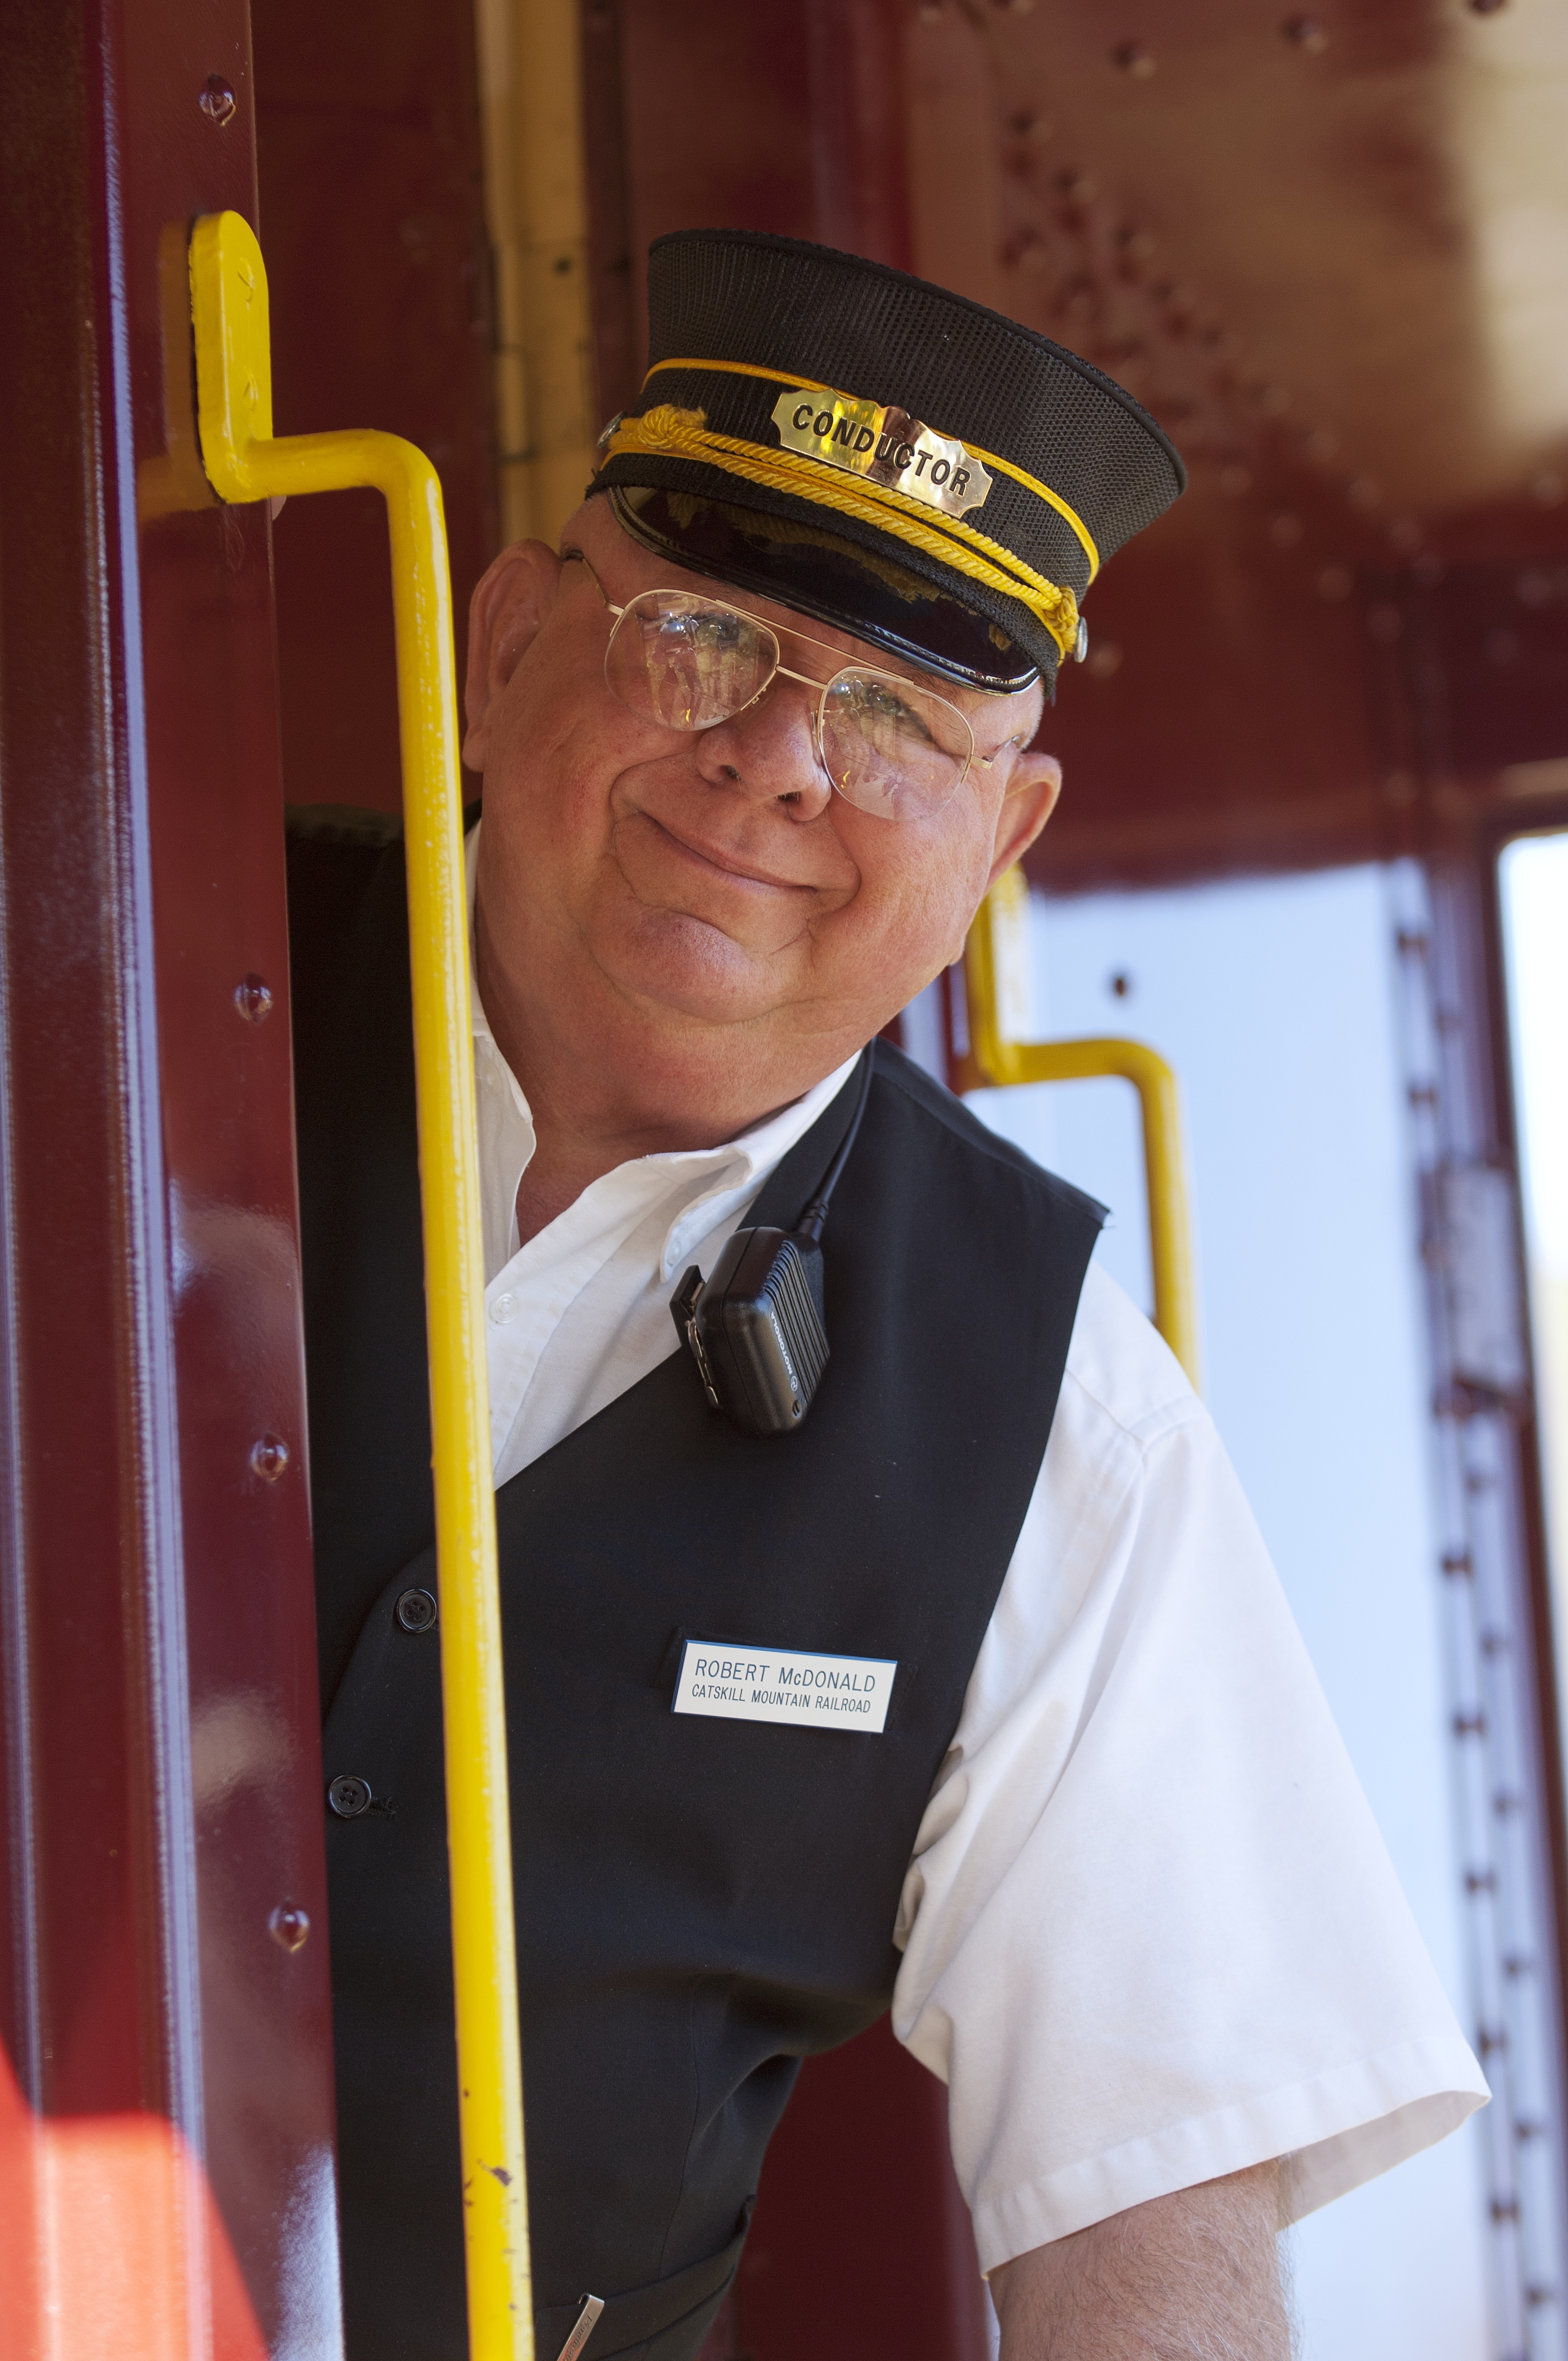 Conductor on Catskill Mountain Railroad